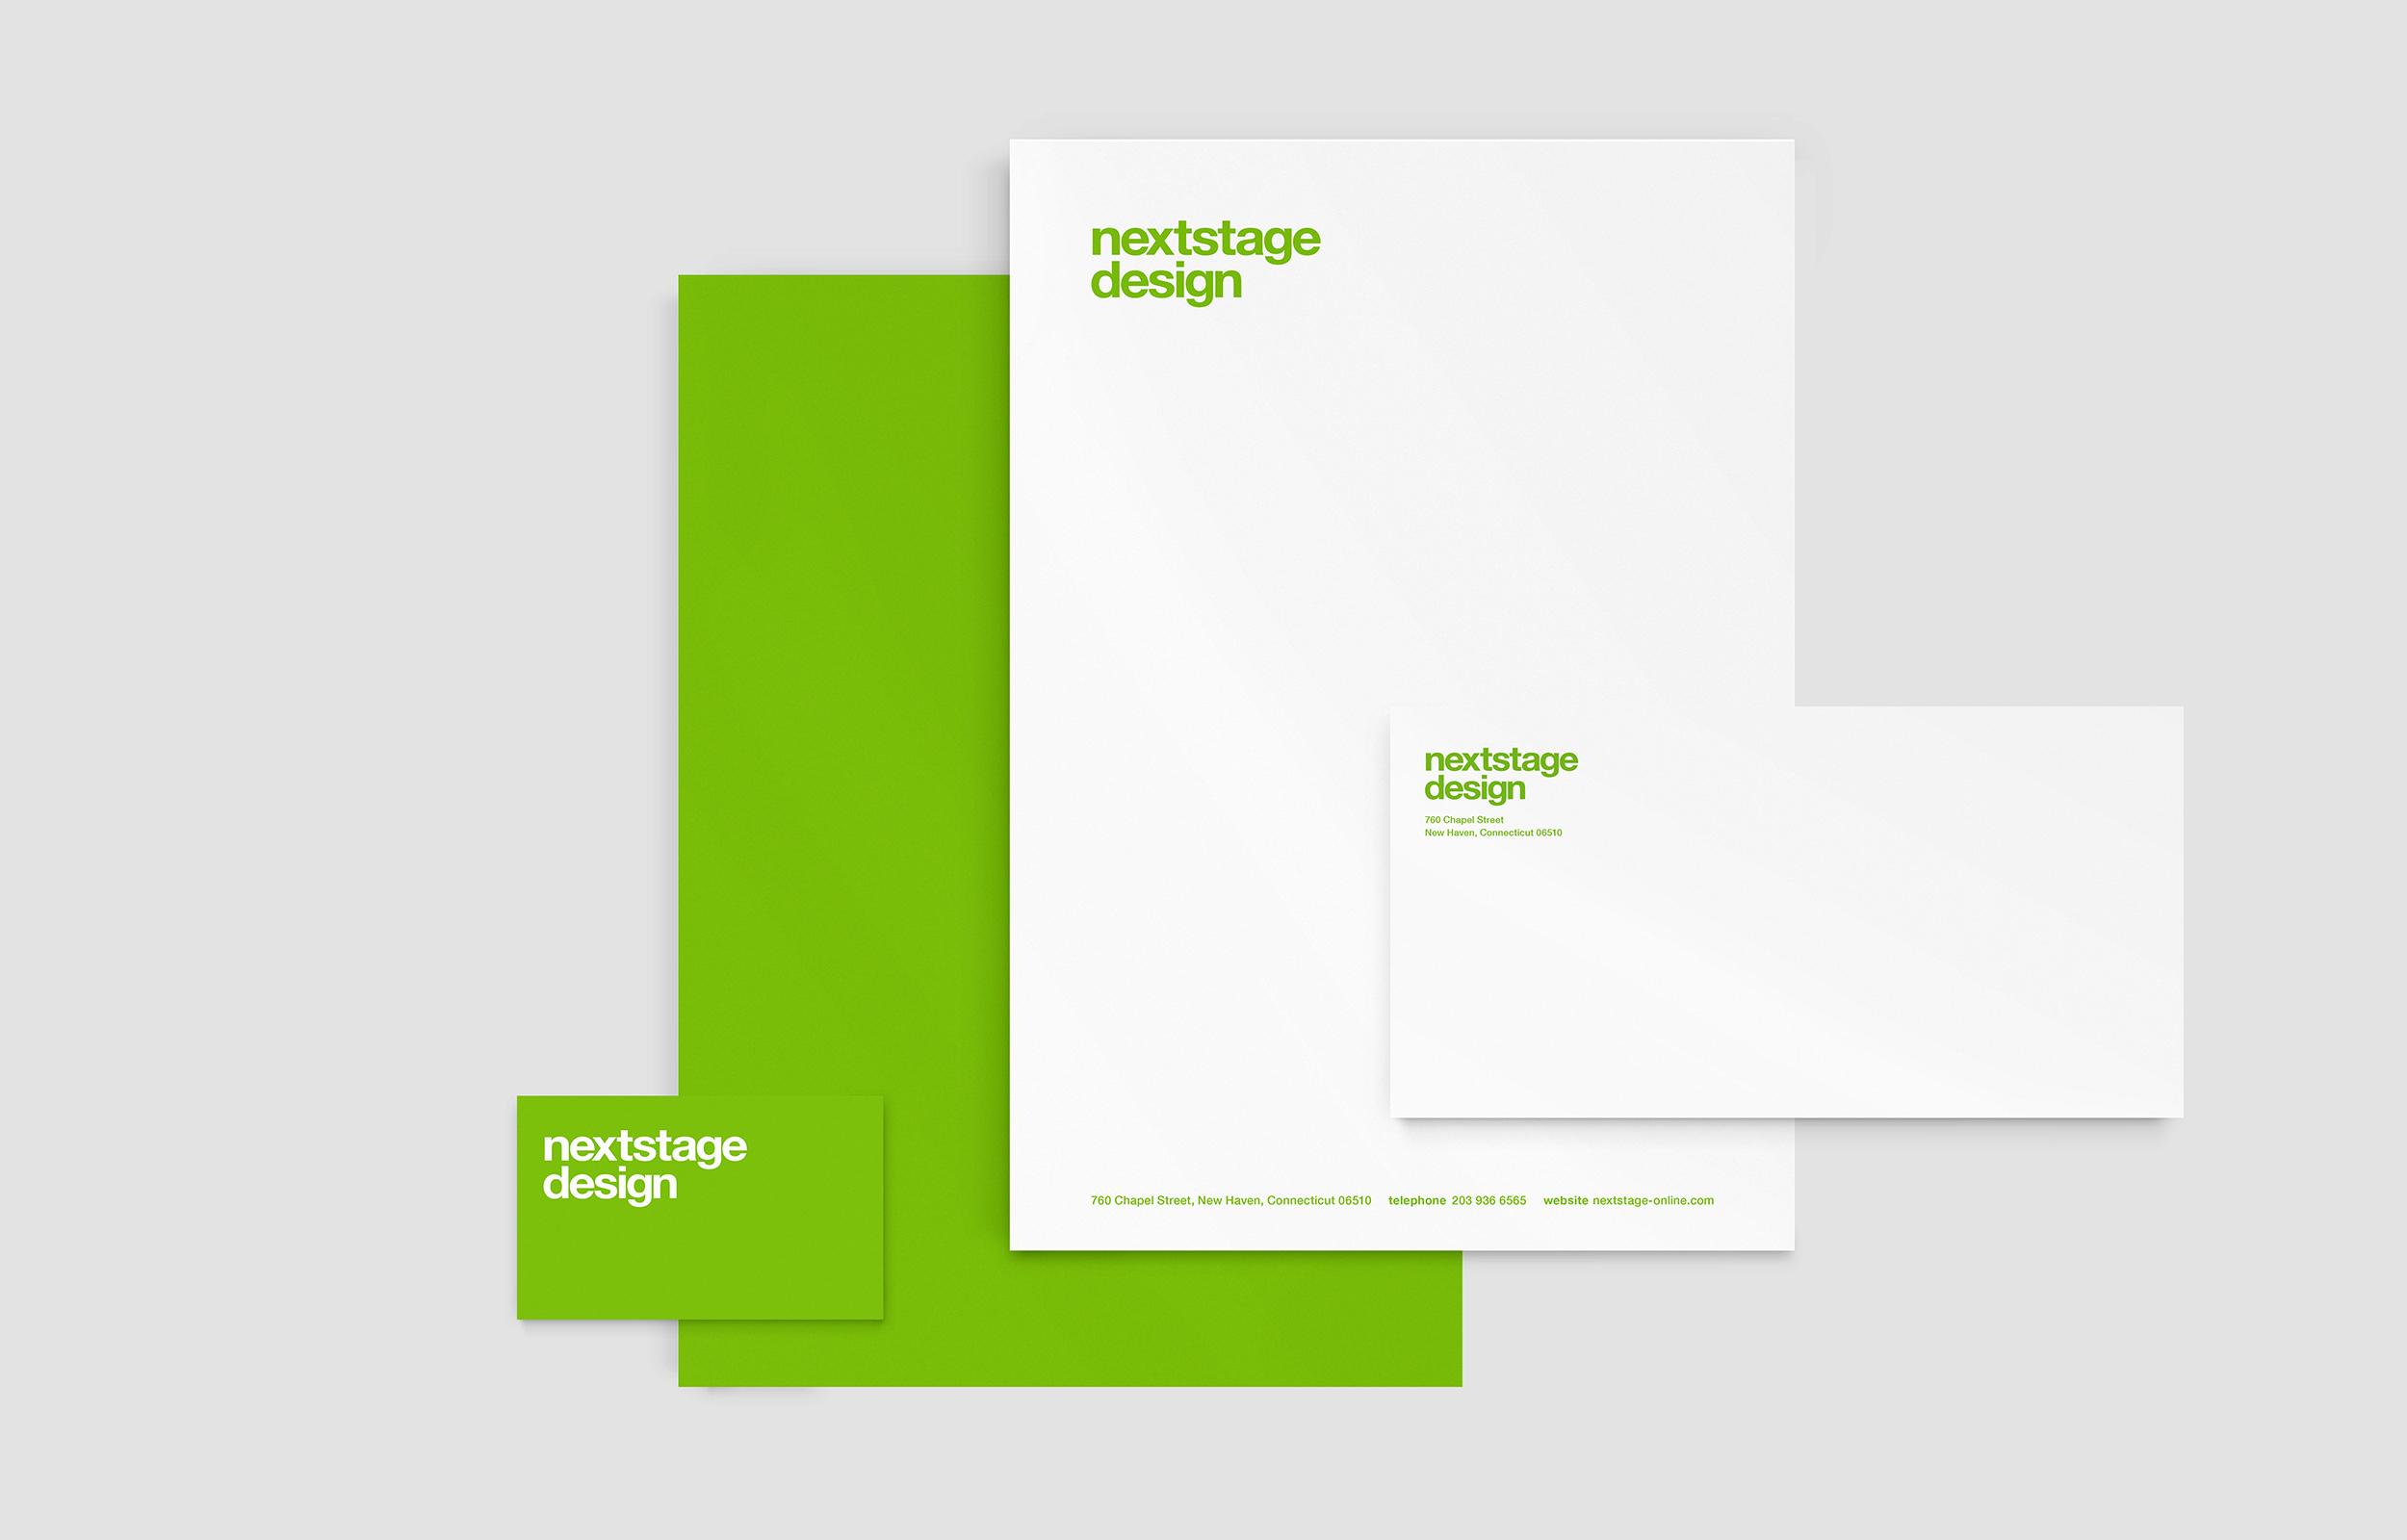 Nextstage-bcard.letterhead.env.jpg